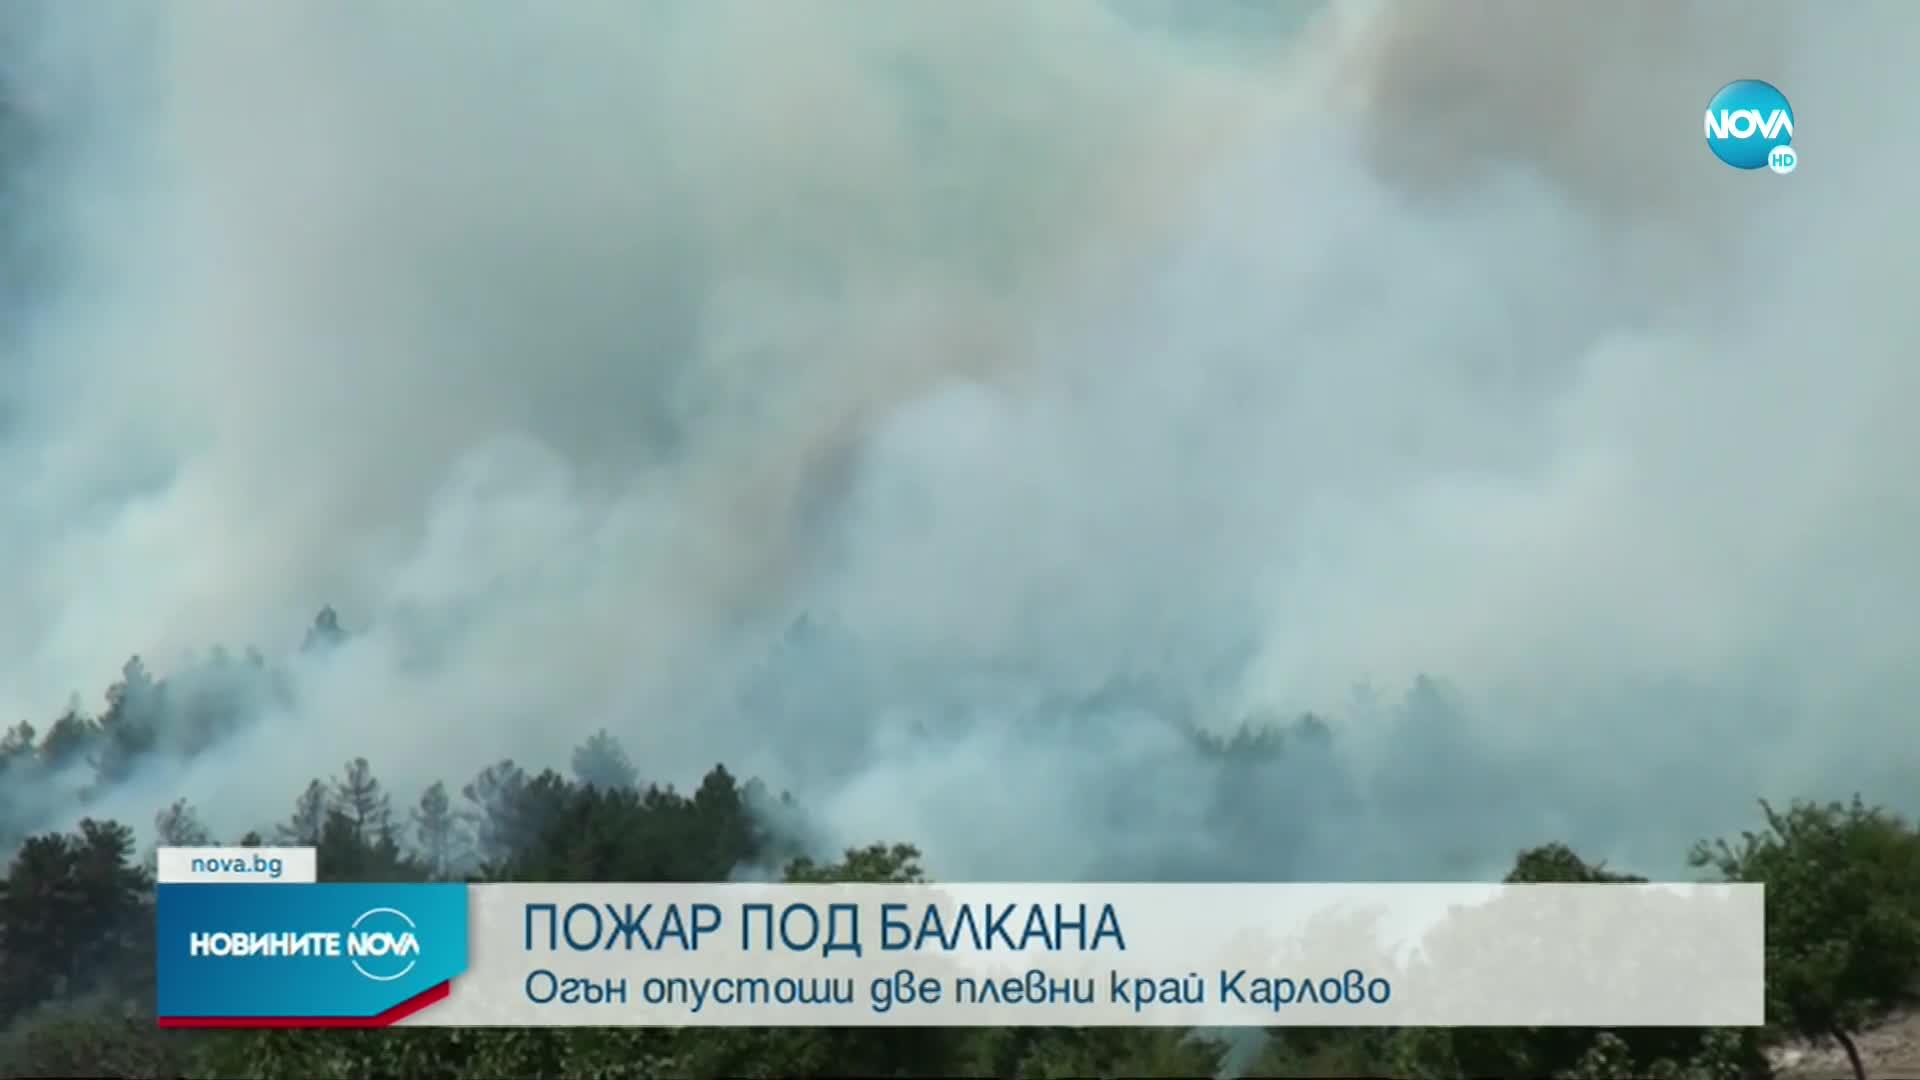 Два пожара бушуват в района на Карлово